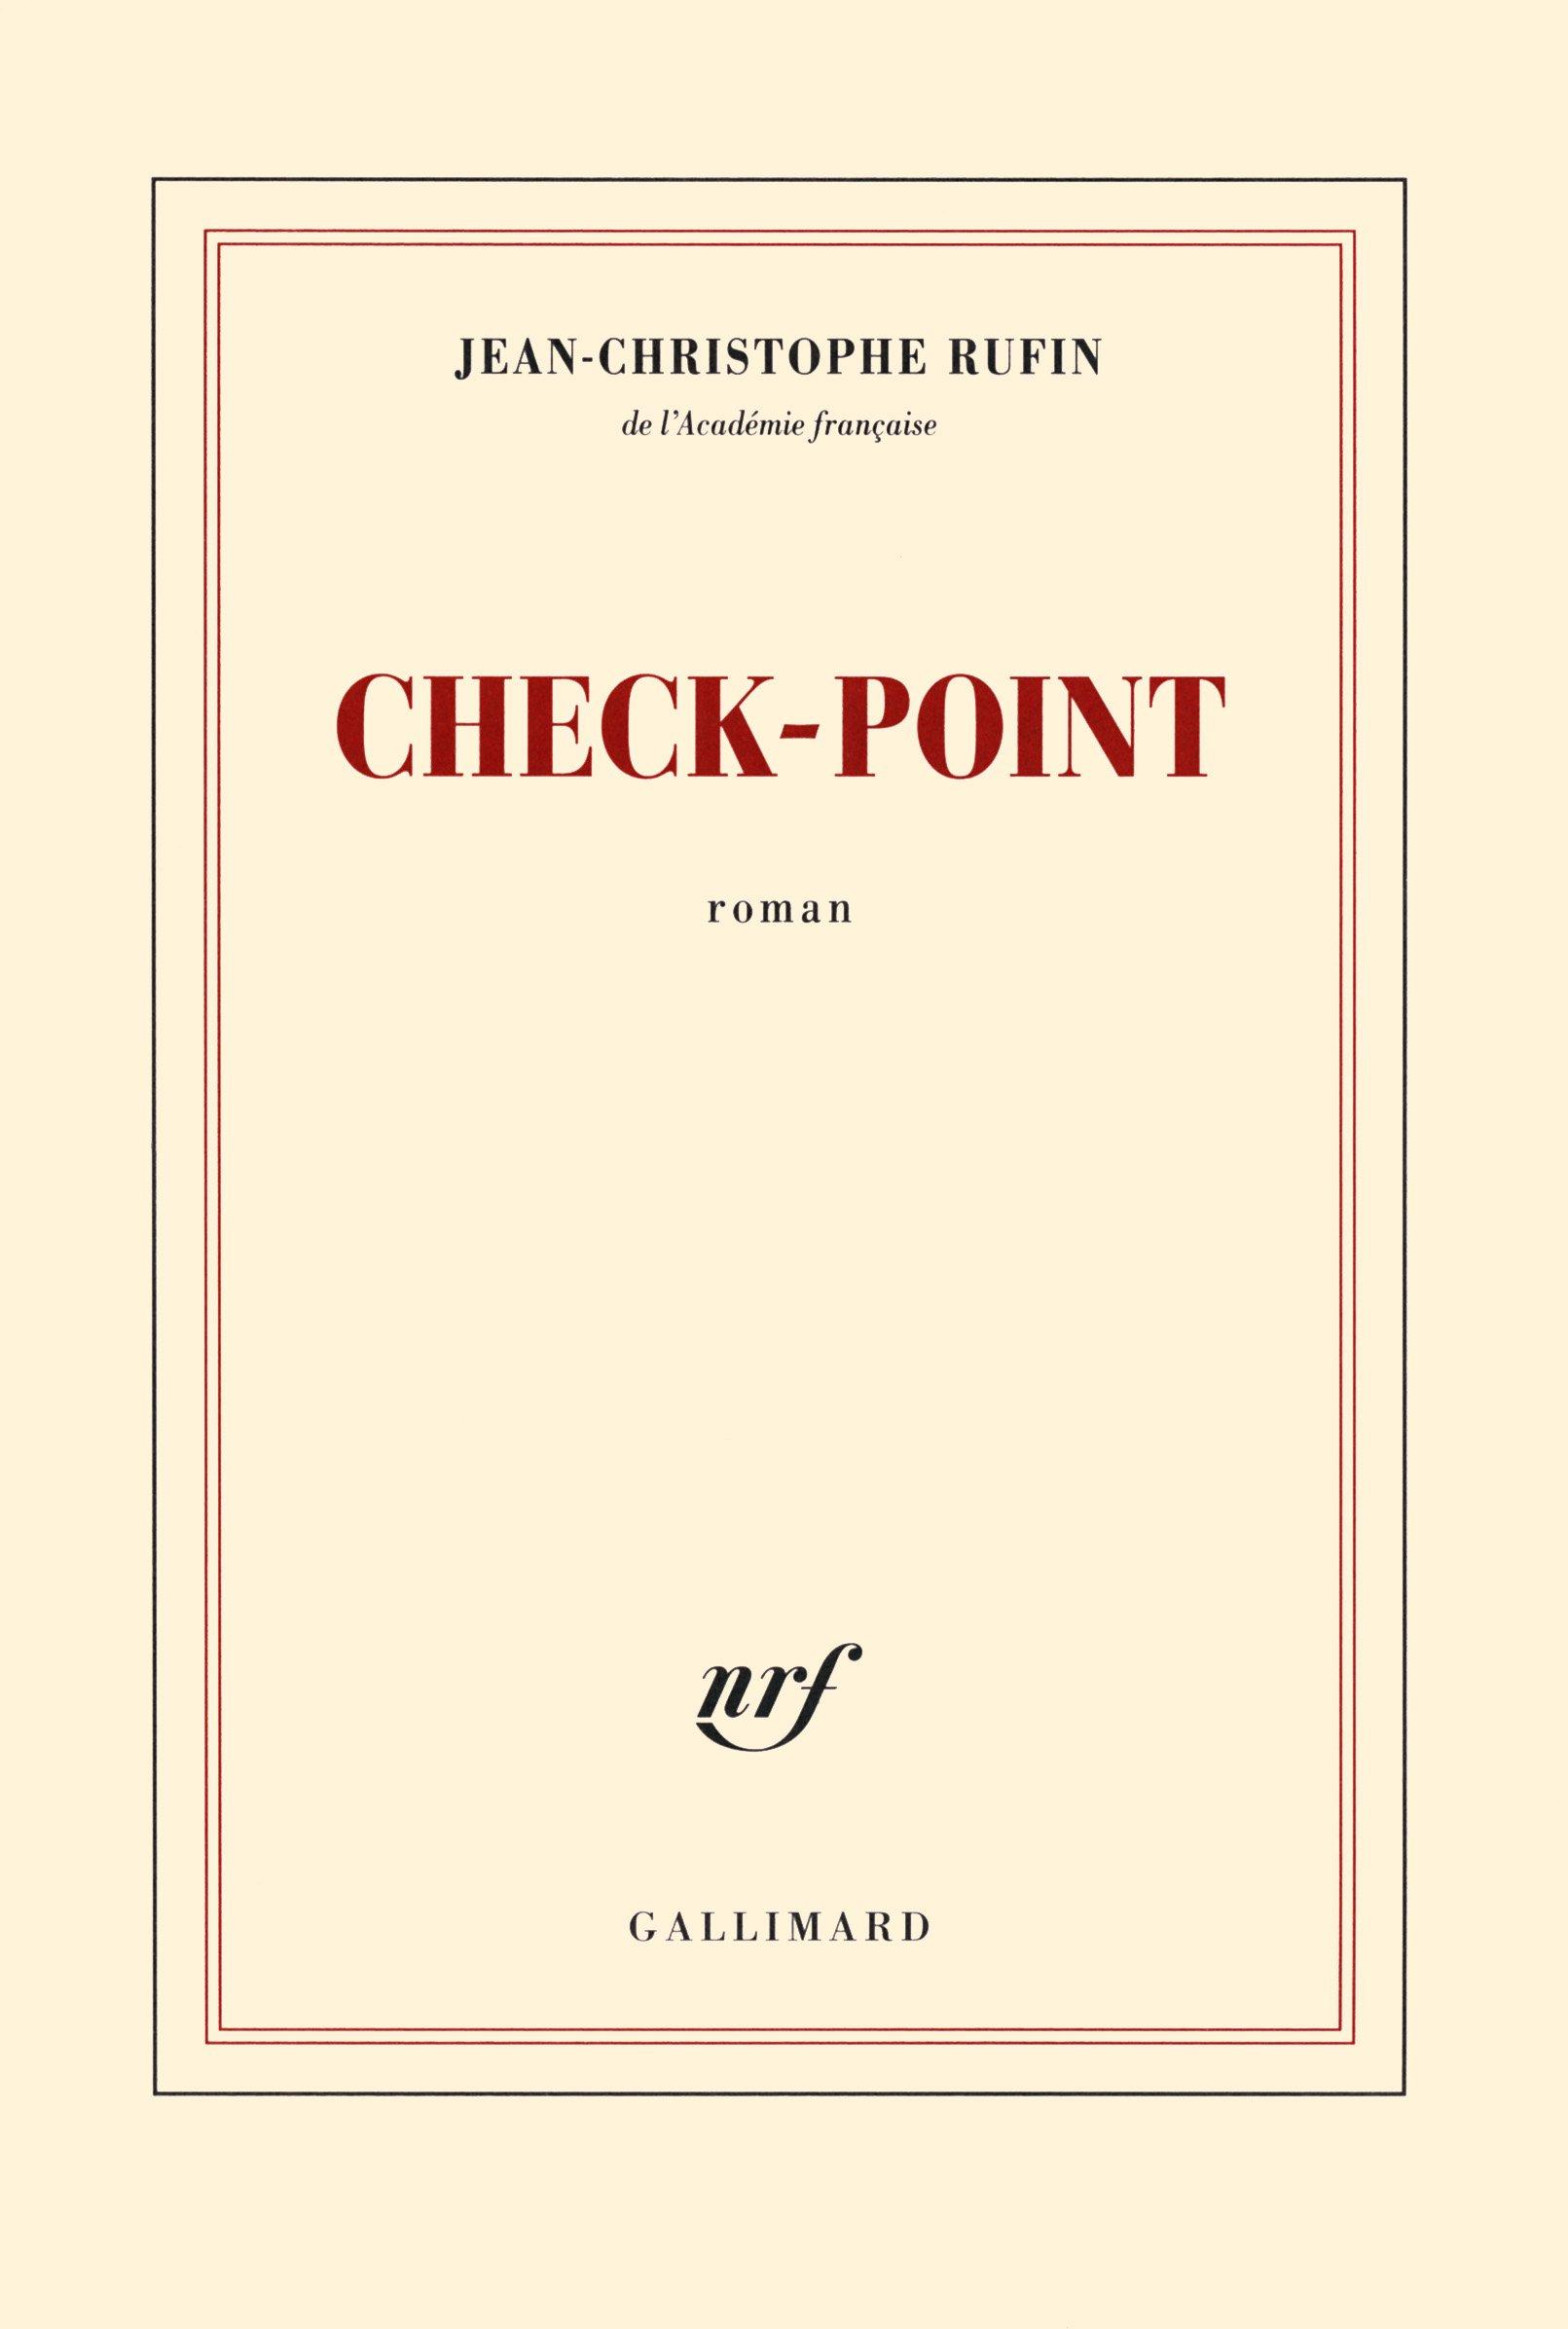 Check-point: Roman